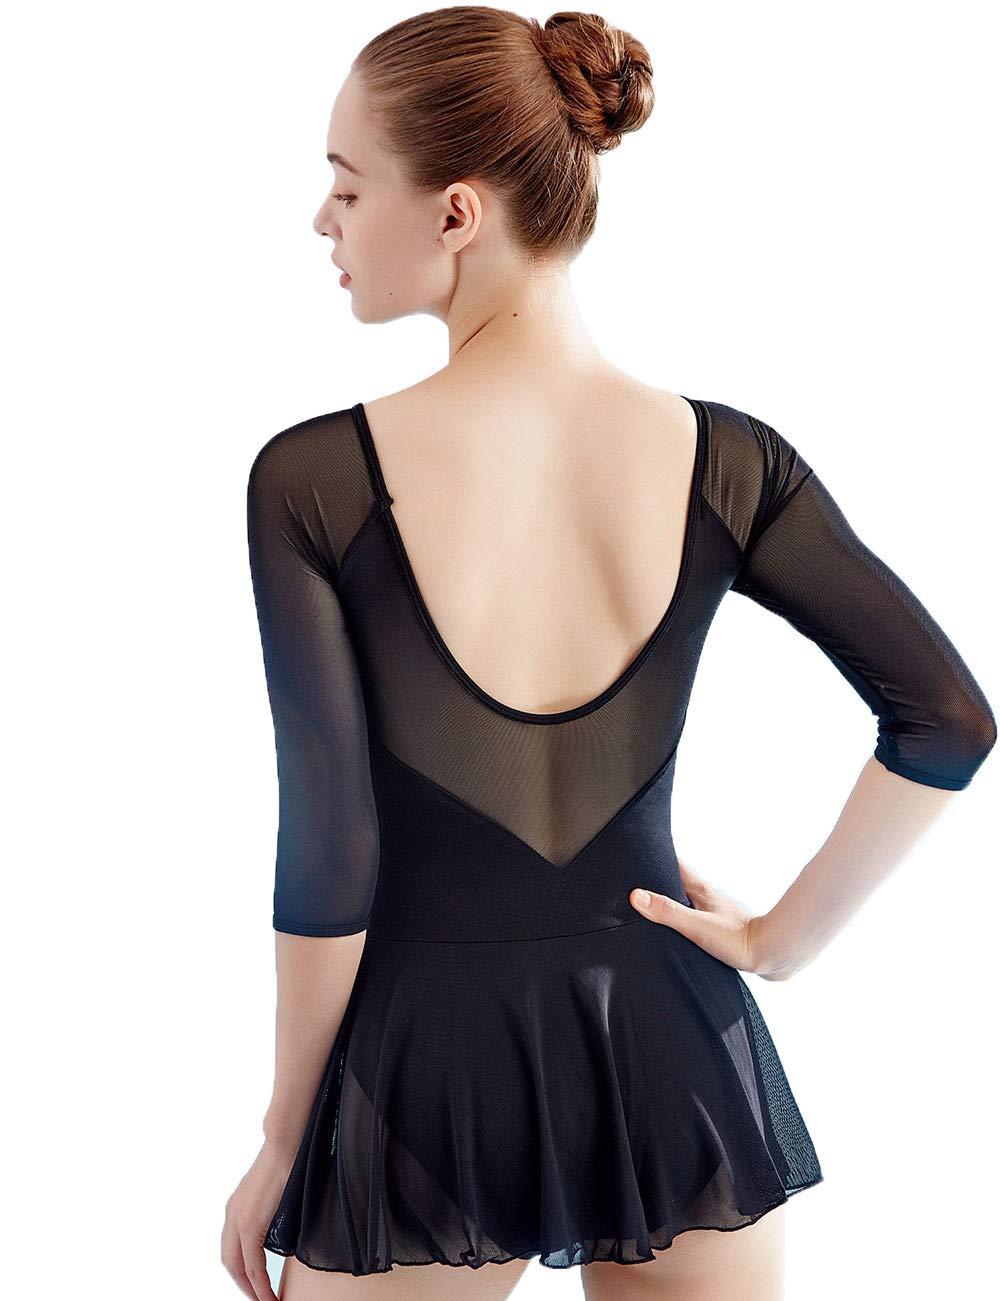 Women's Adult Skirted Leotards Dance Dress for Ballet, Aerobics